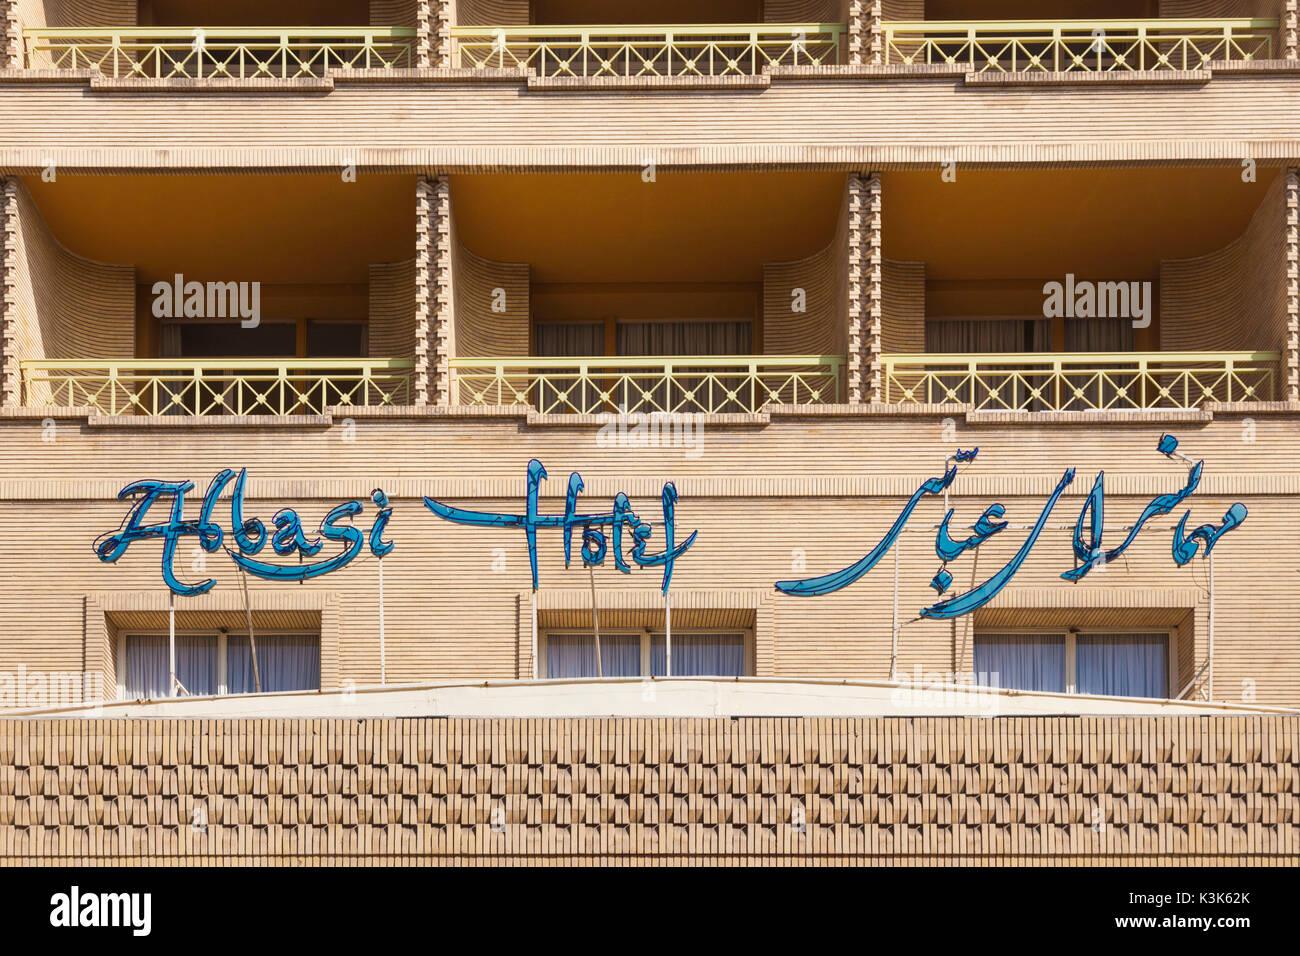 Iran, Central Iran, Esfahan, Abbasi Hotel, exterior sign - Stock Image